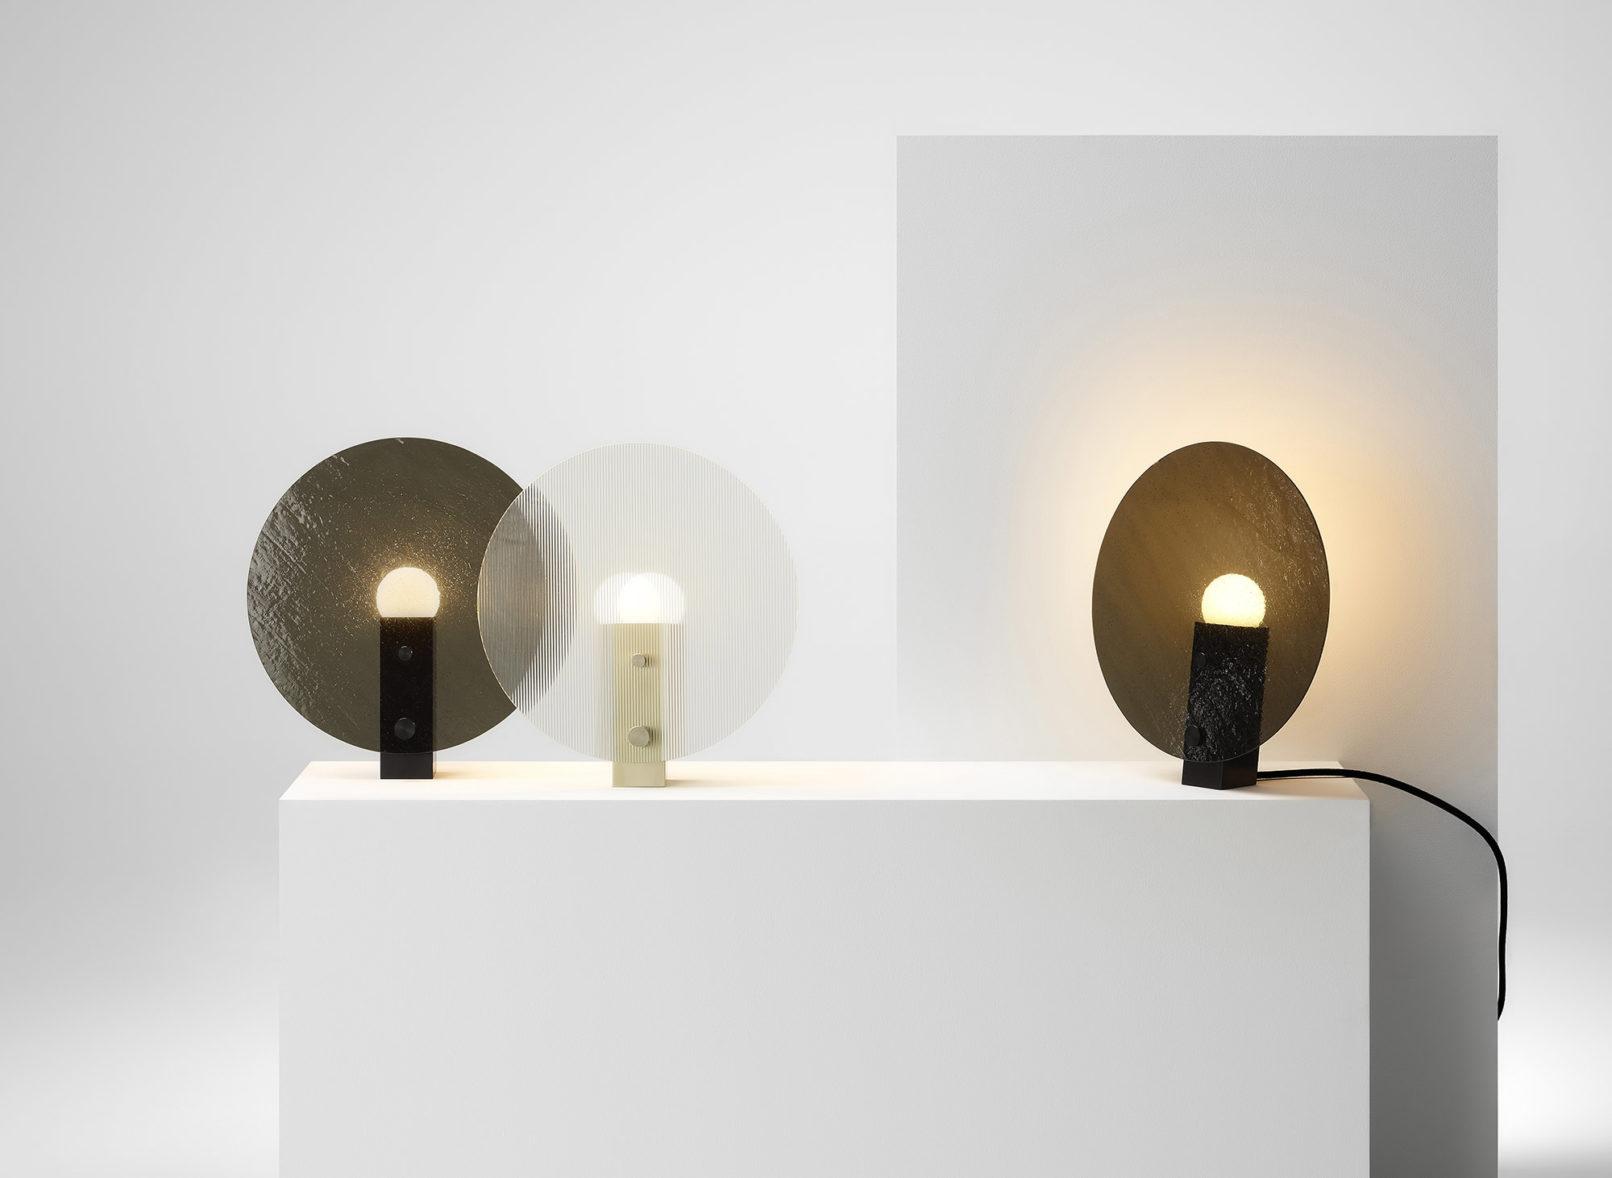 Nebulae_Desk_Lamp_7_1-1612x1178.jpg